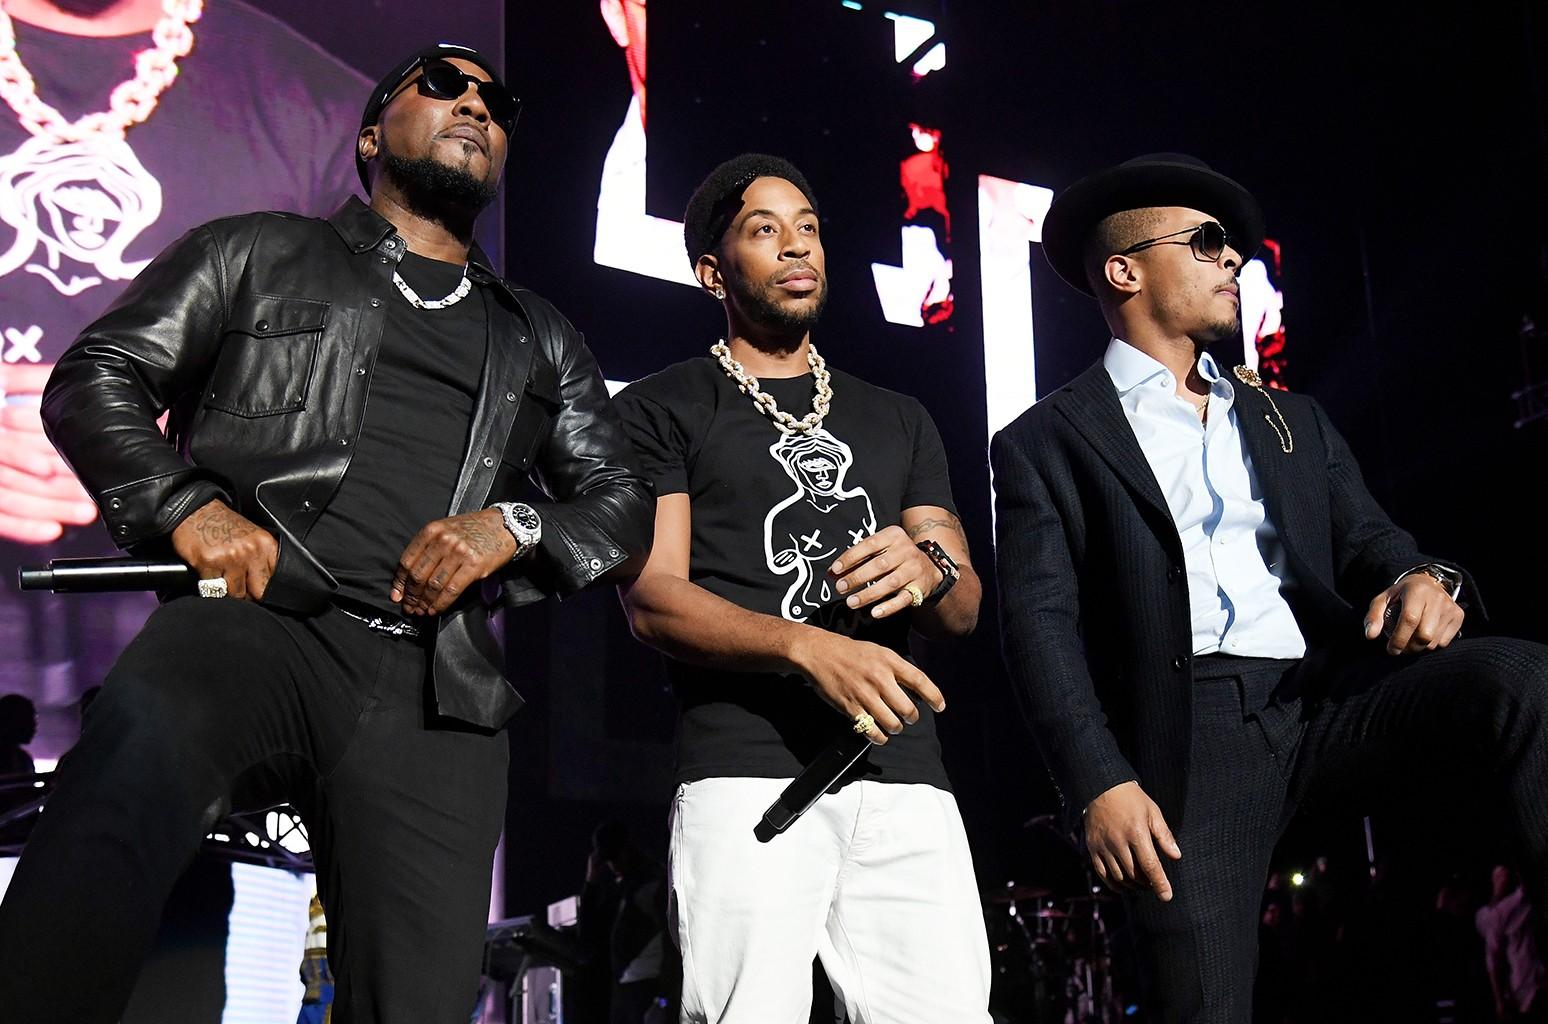 Young Jeezy Ludacris TI